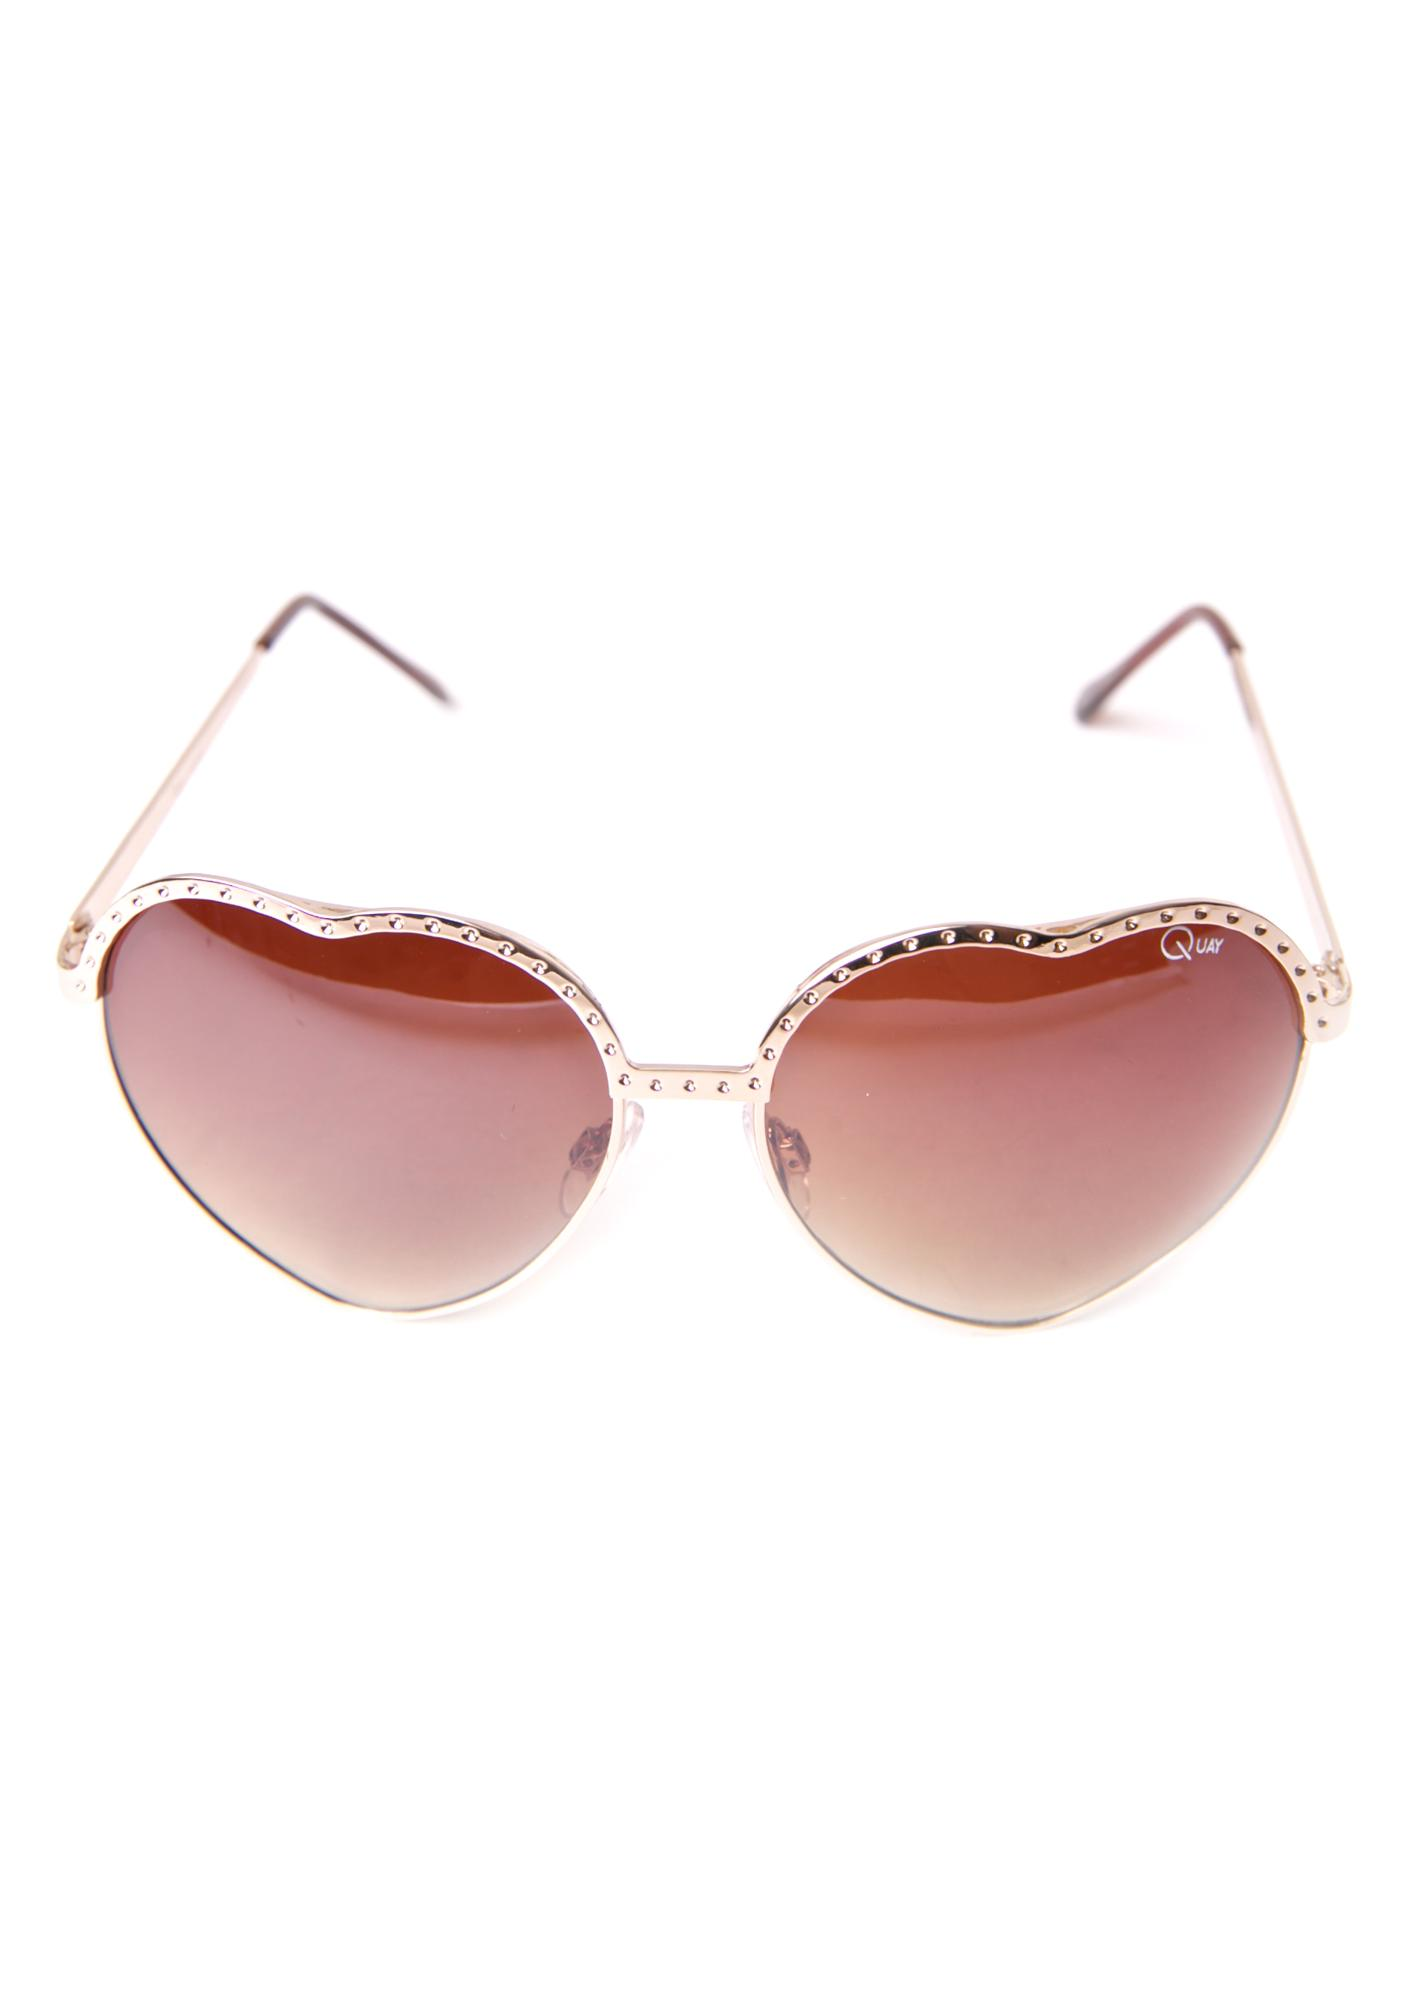 Quay Eyeware Hearts Sunglasses